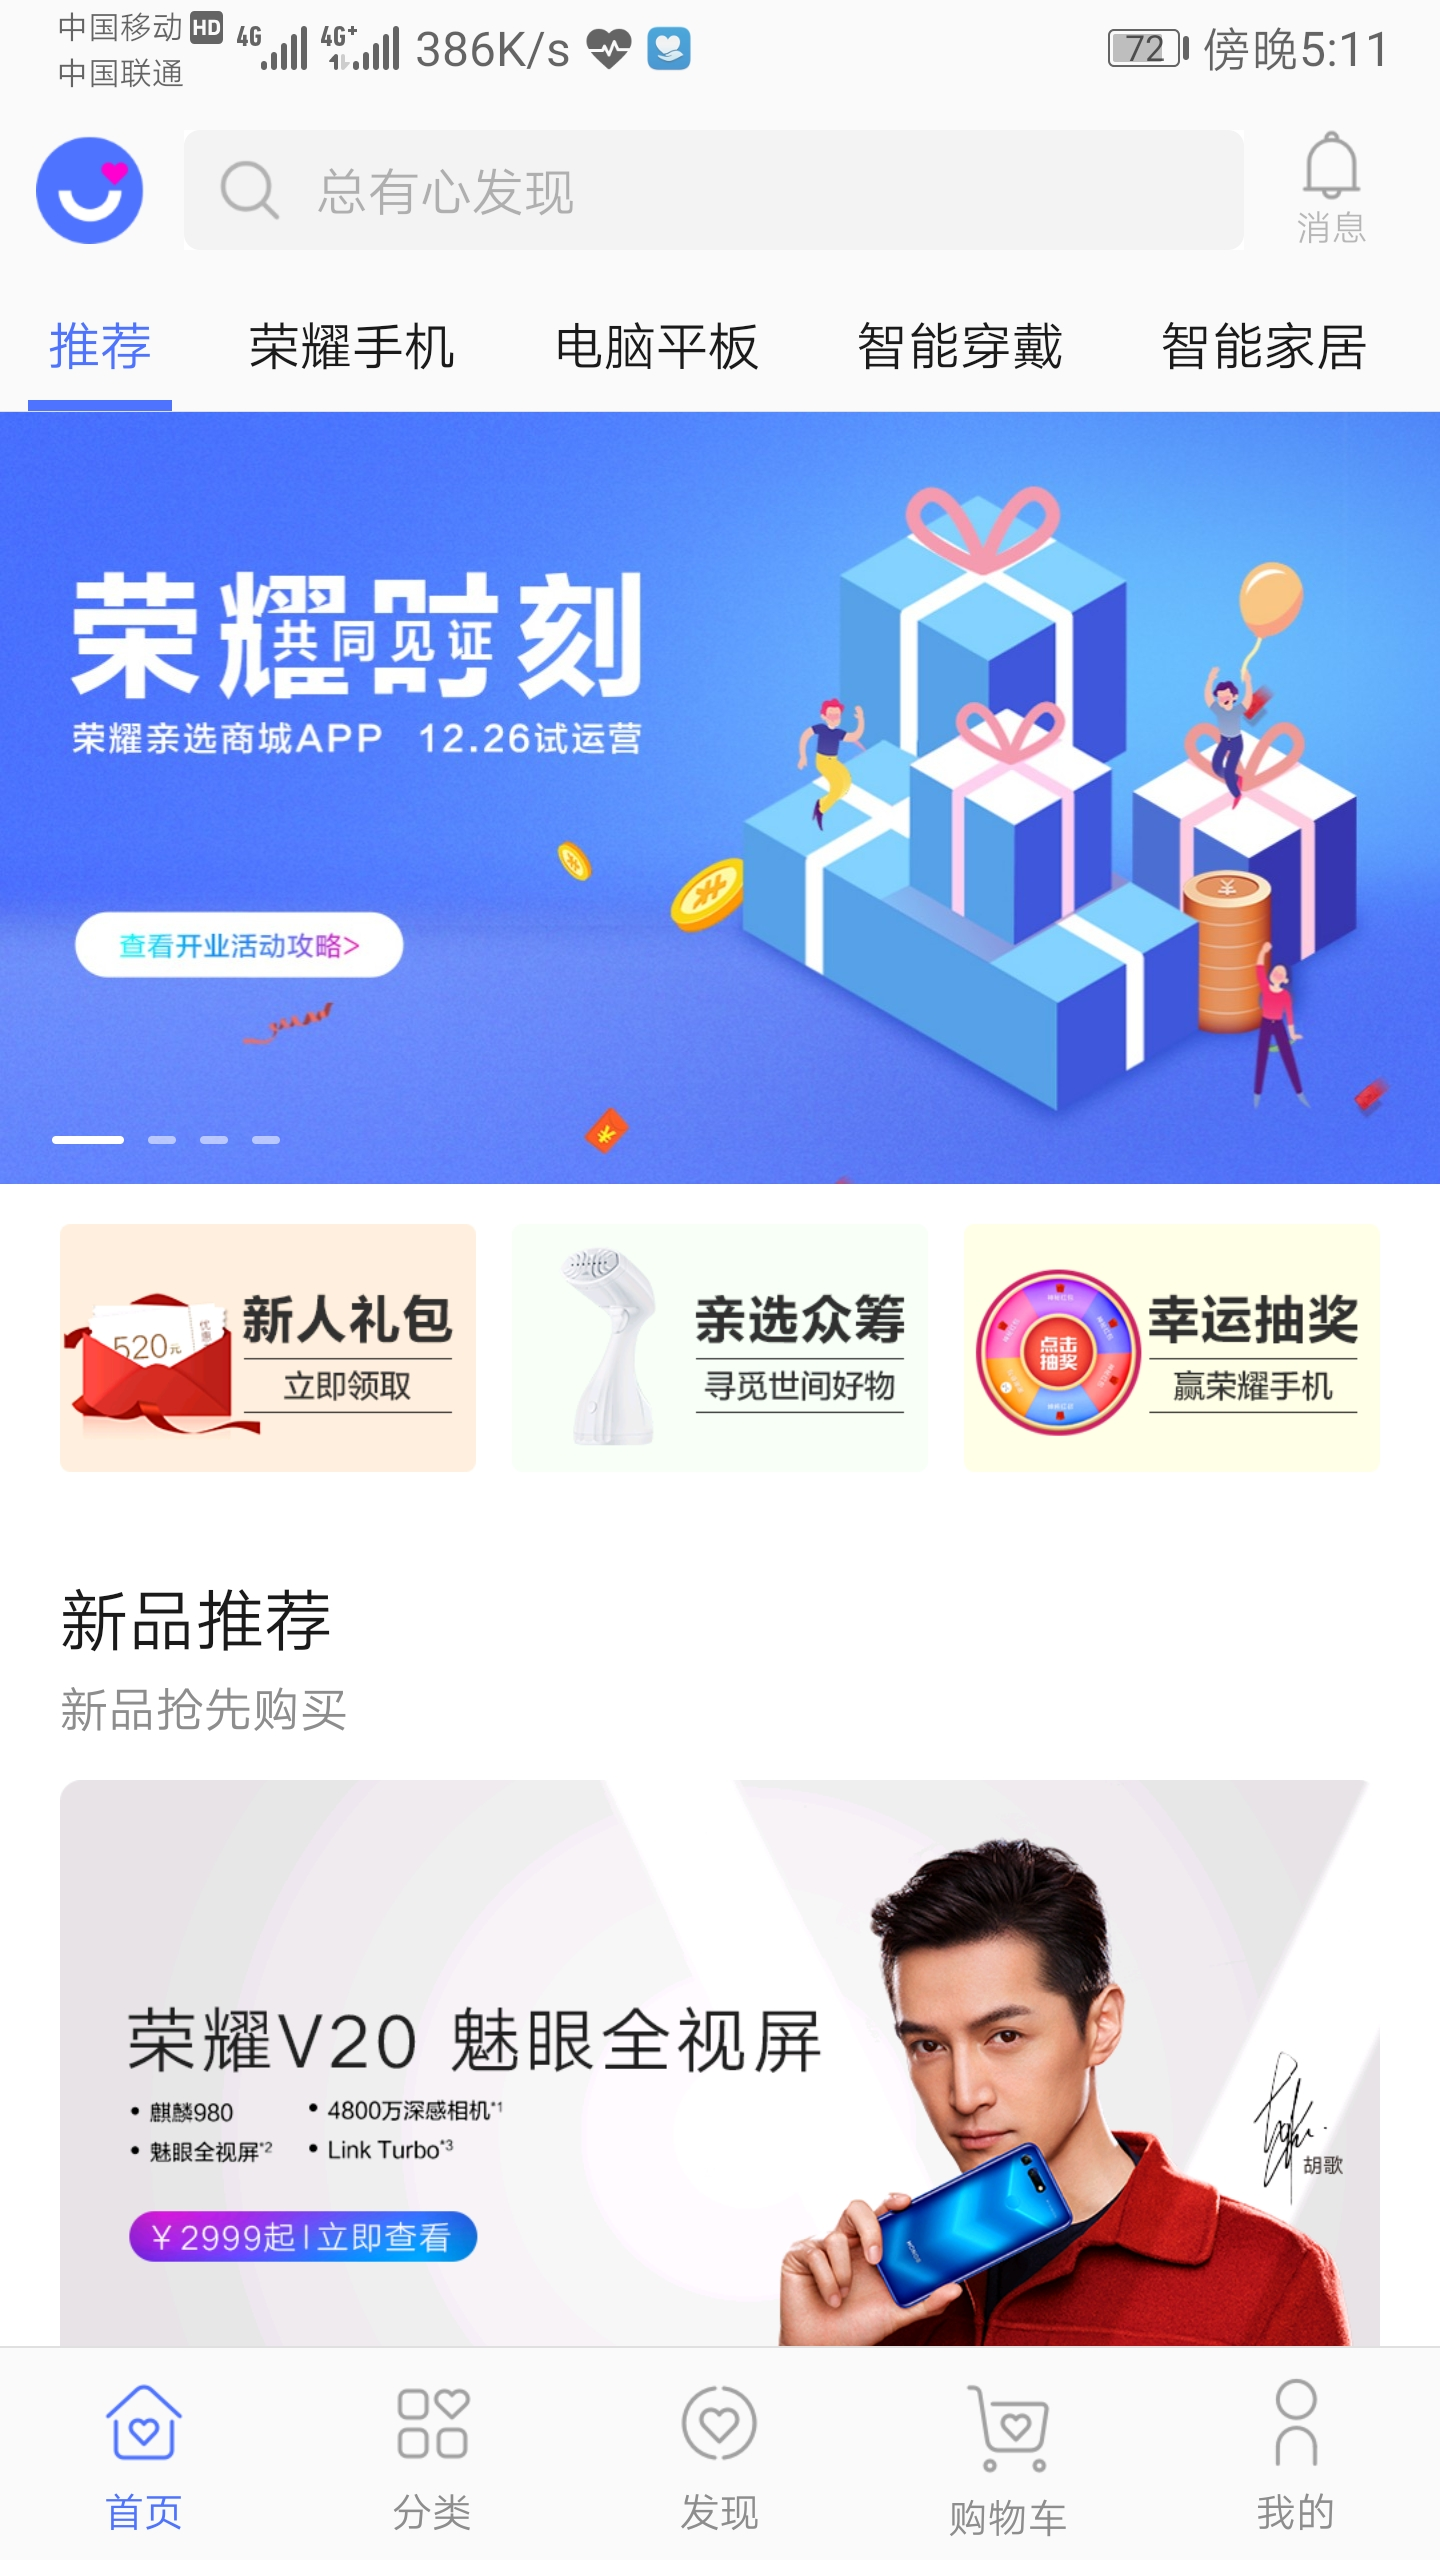 Screenshot_20181226_171123_cn.honor.qinxuan.jpg